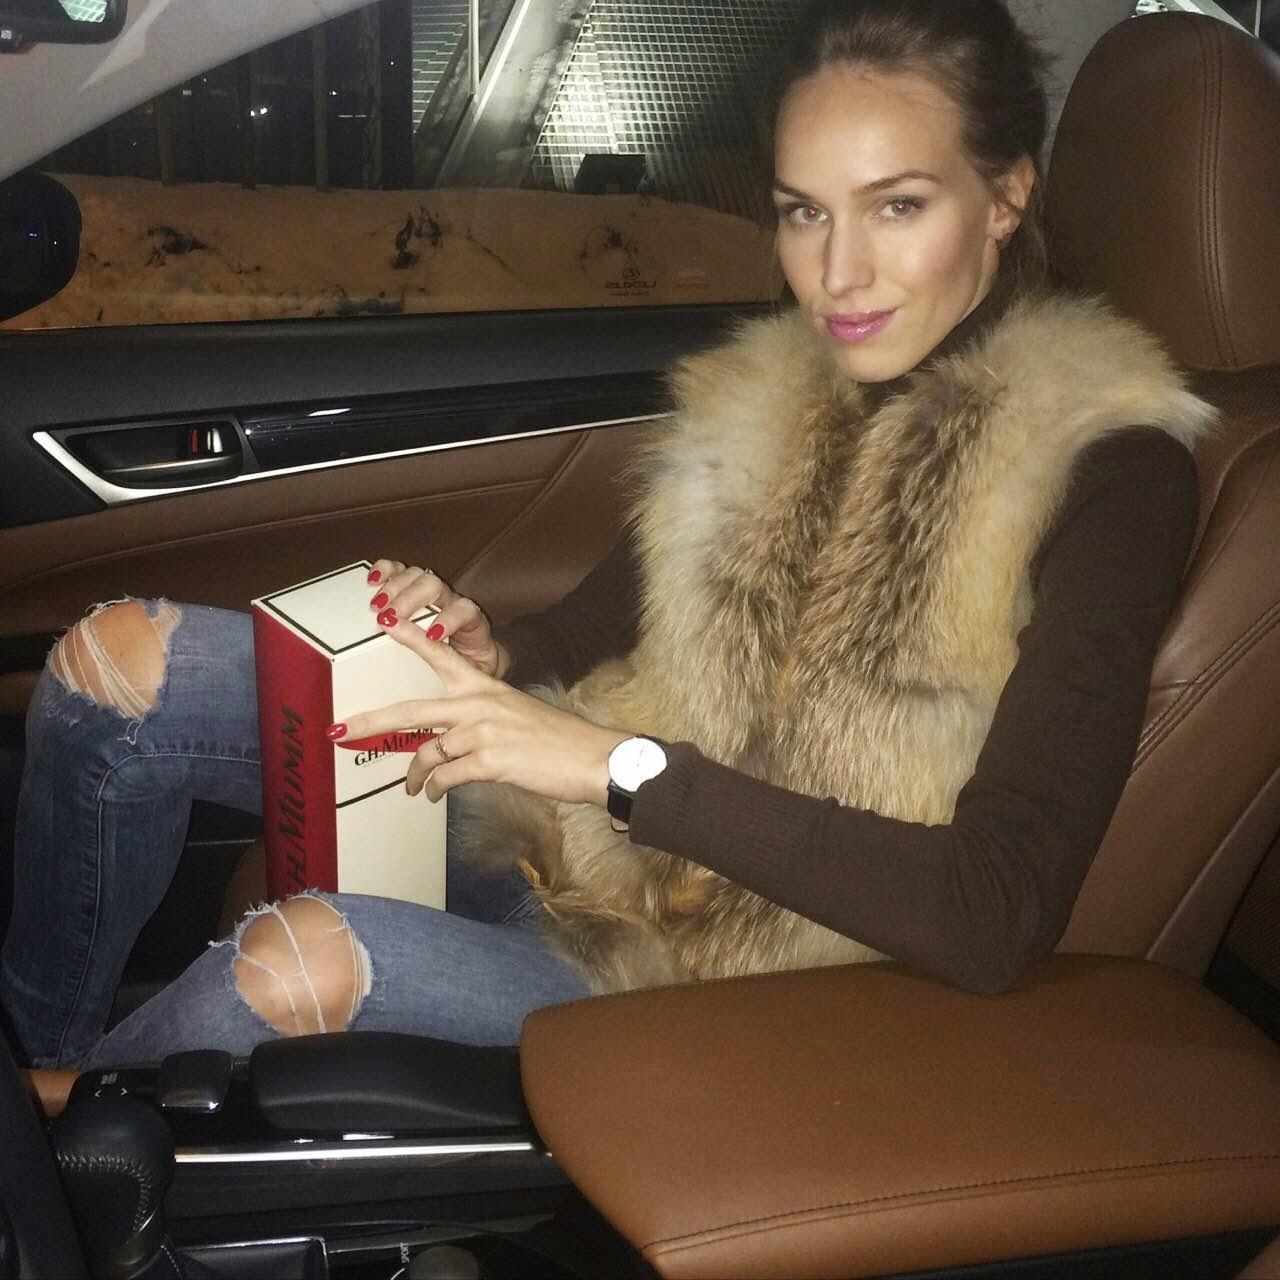 fur-vest-mumm-champain-lexus-luxury